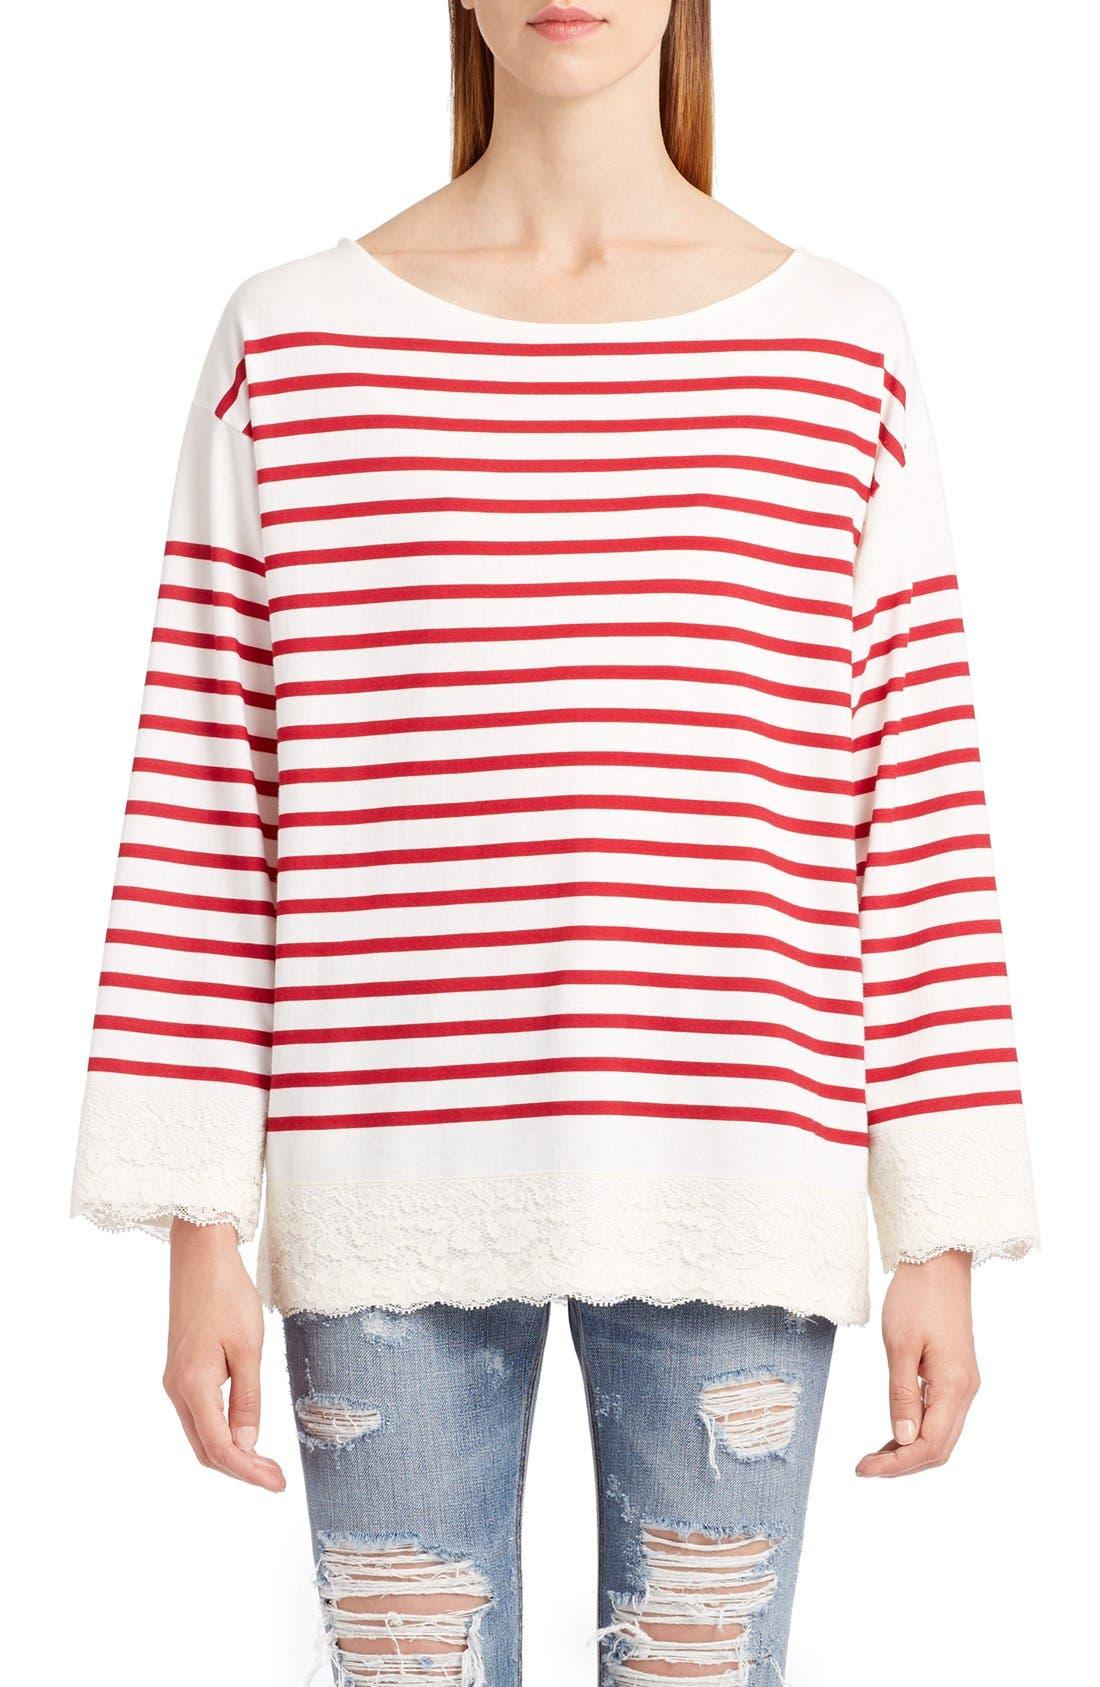 Alternate Image 1 Selected - Dolce&Gabbana Lace Stripe Tee